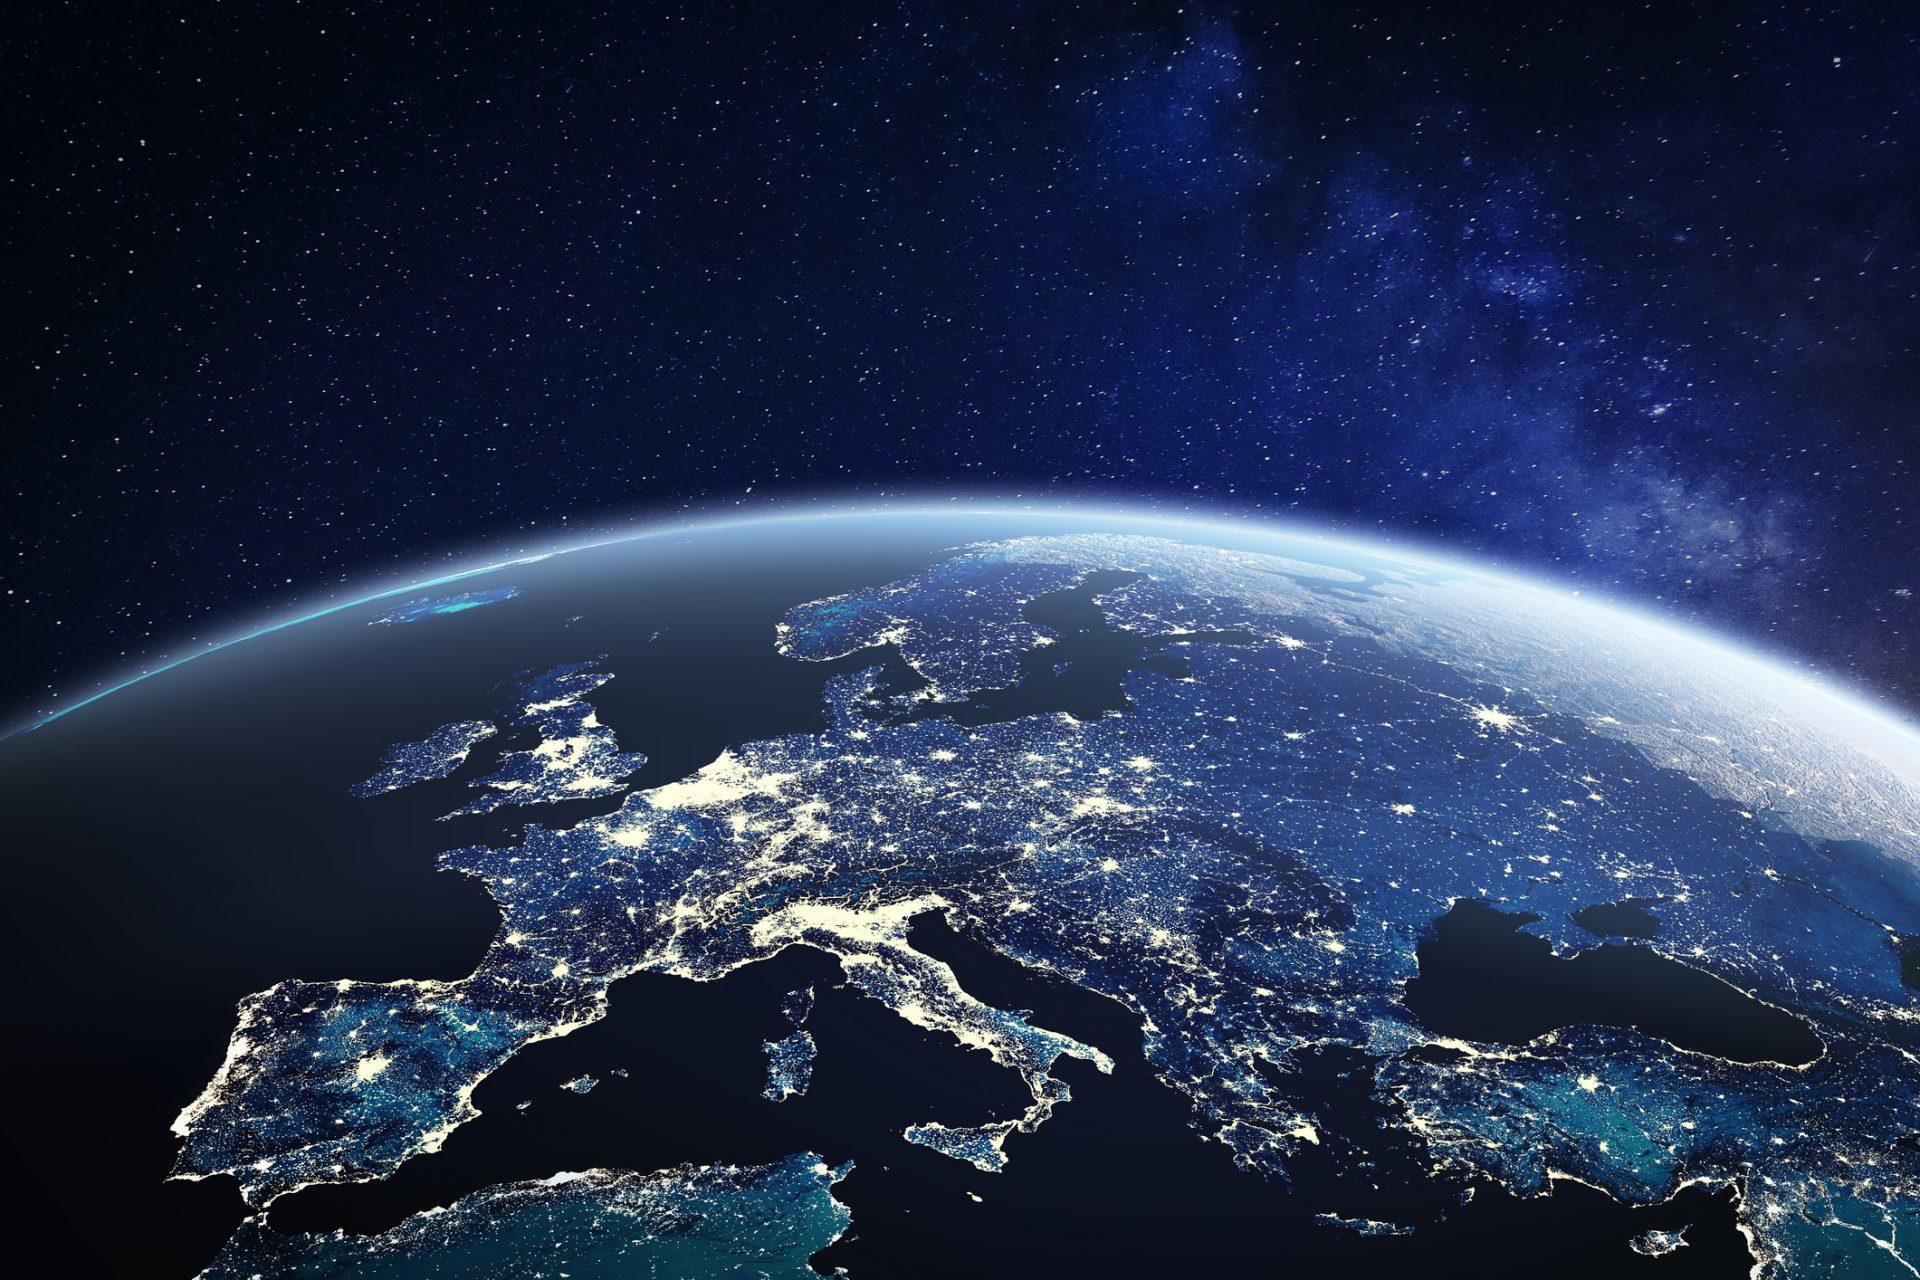 Funding opportunities for small and medium-sized enterprises through the new EU framework program